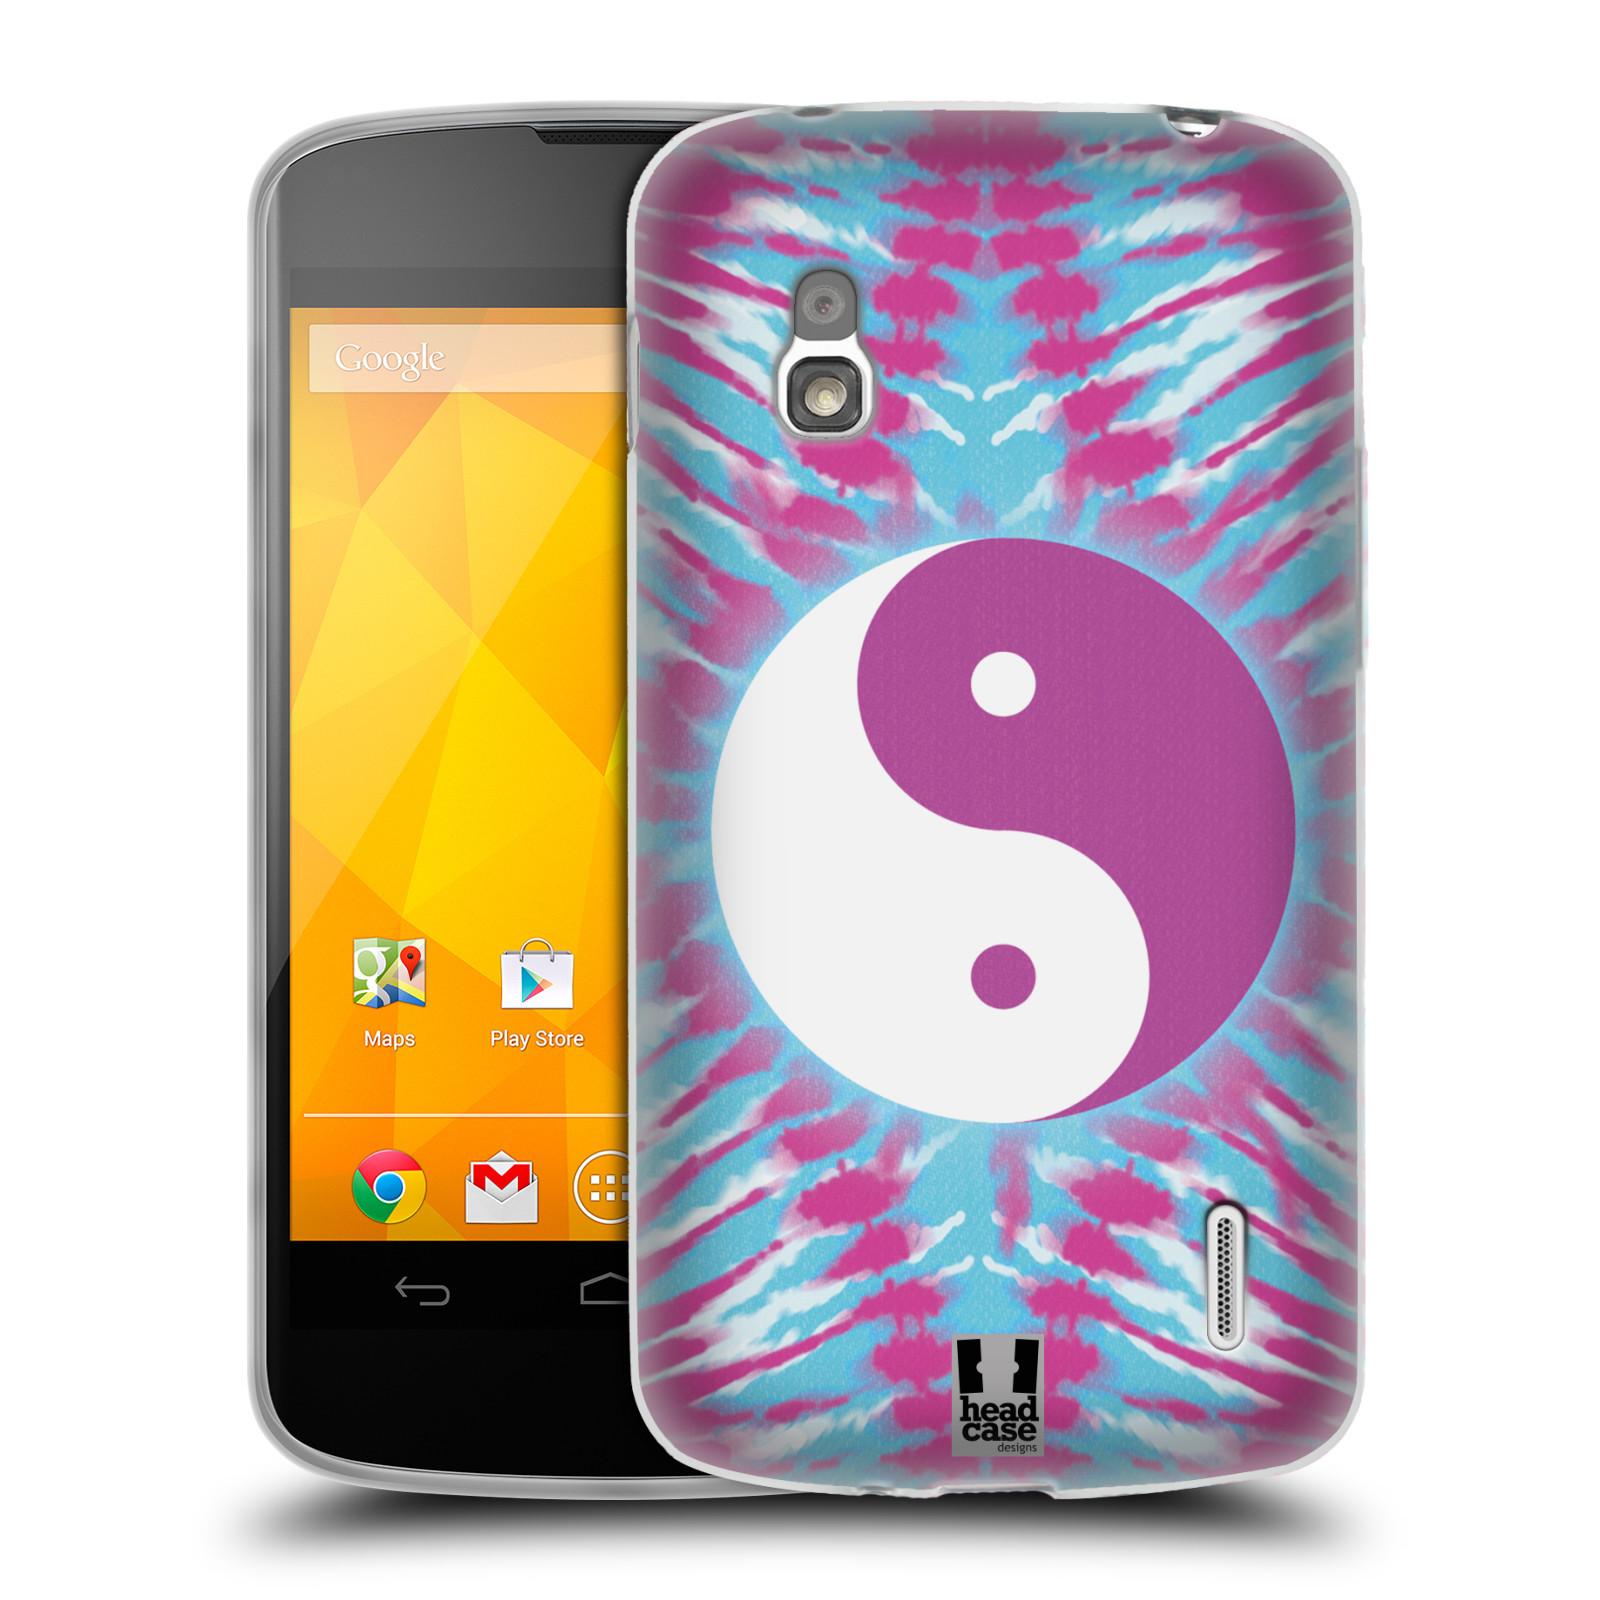 HEAD CASE DESIGNS TIE DYE MIX SOFT GEL CASE FOR LG PHONES 3